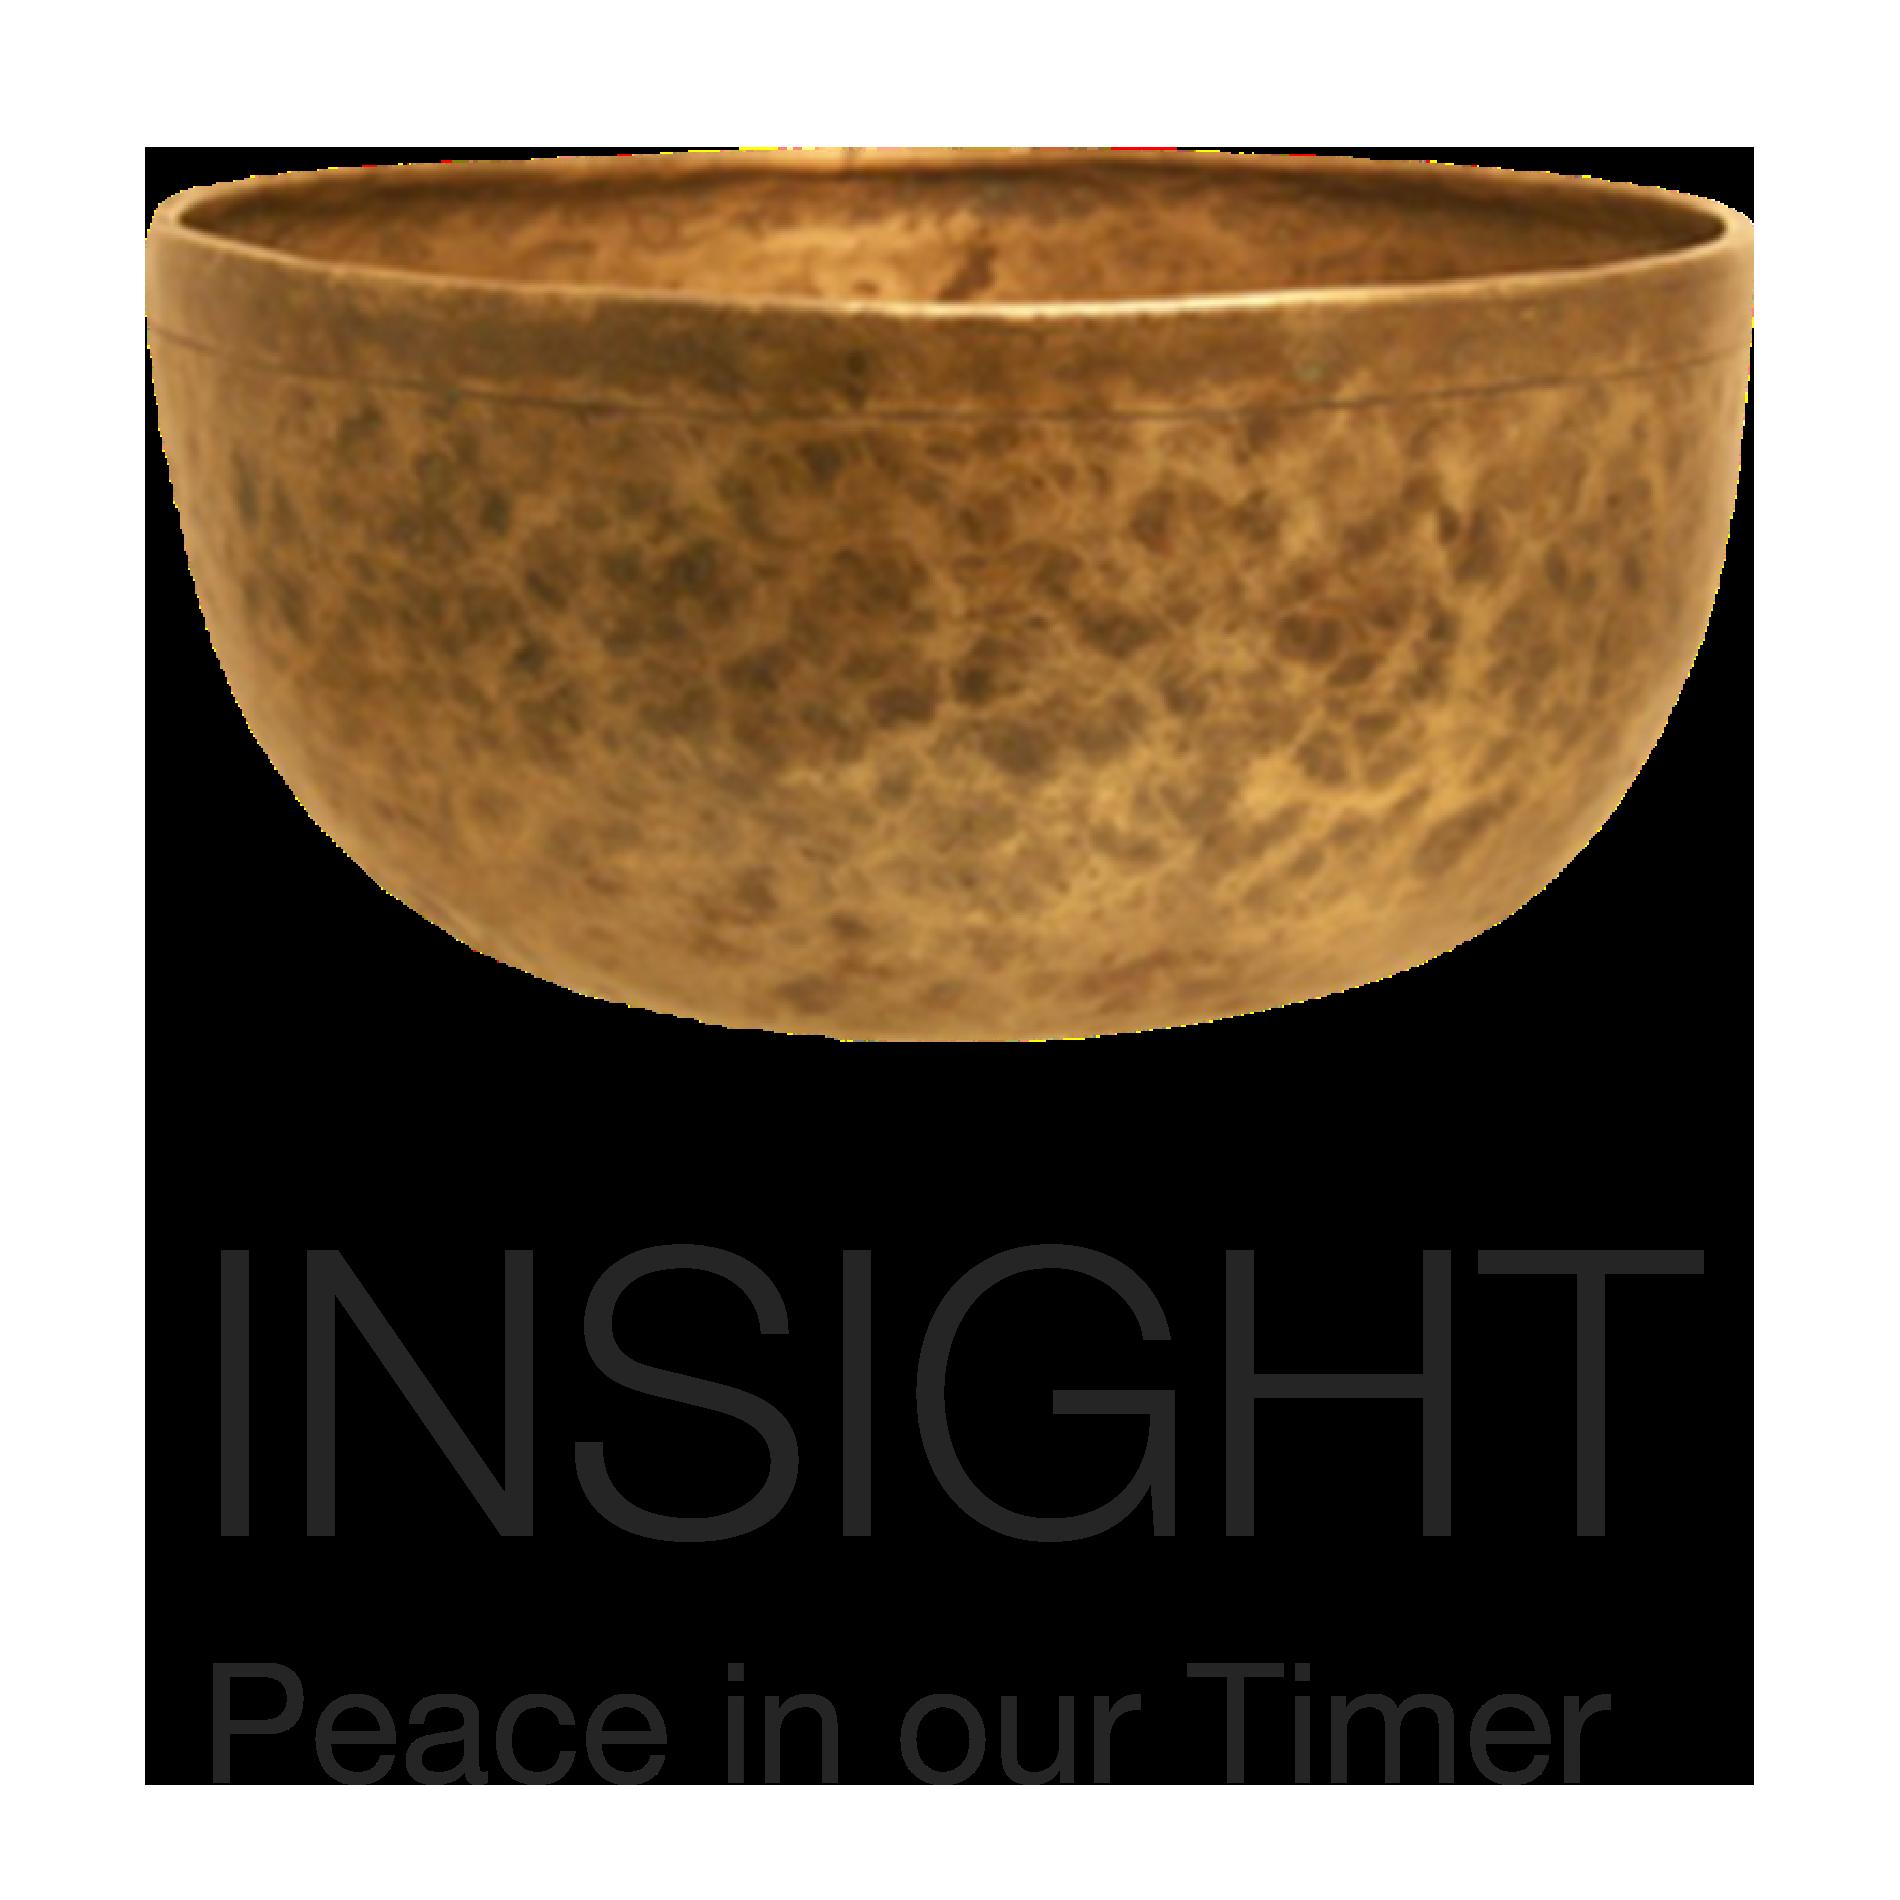 InsightTimer.com